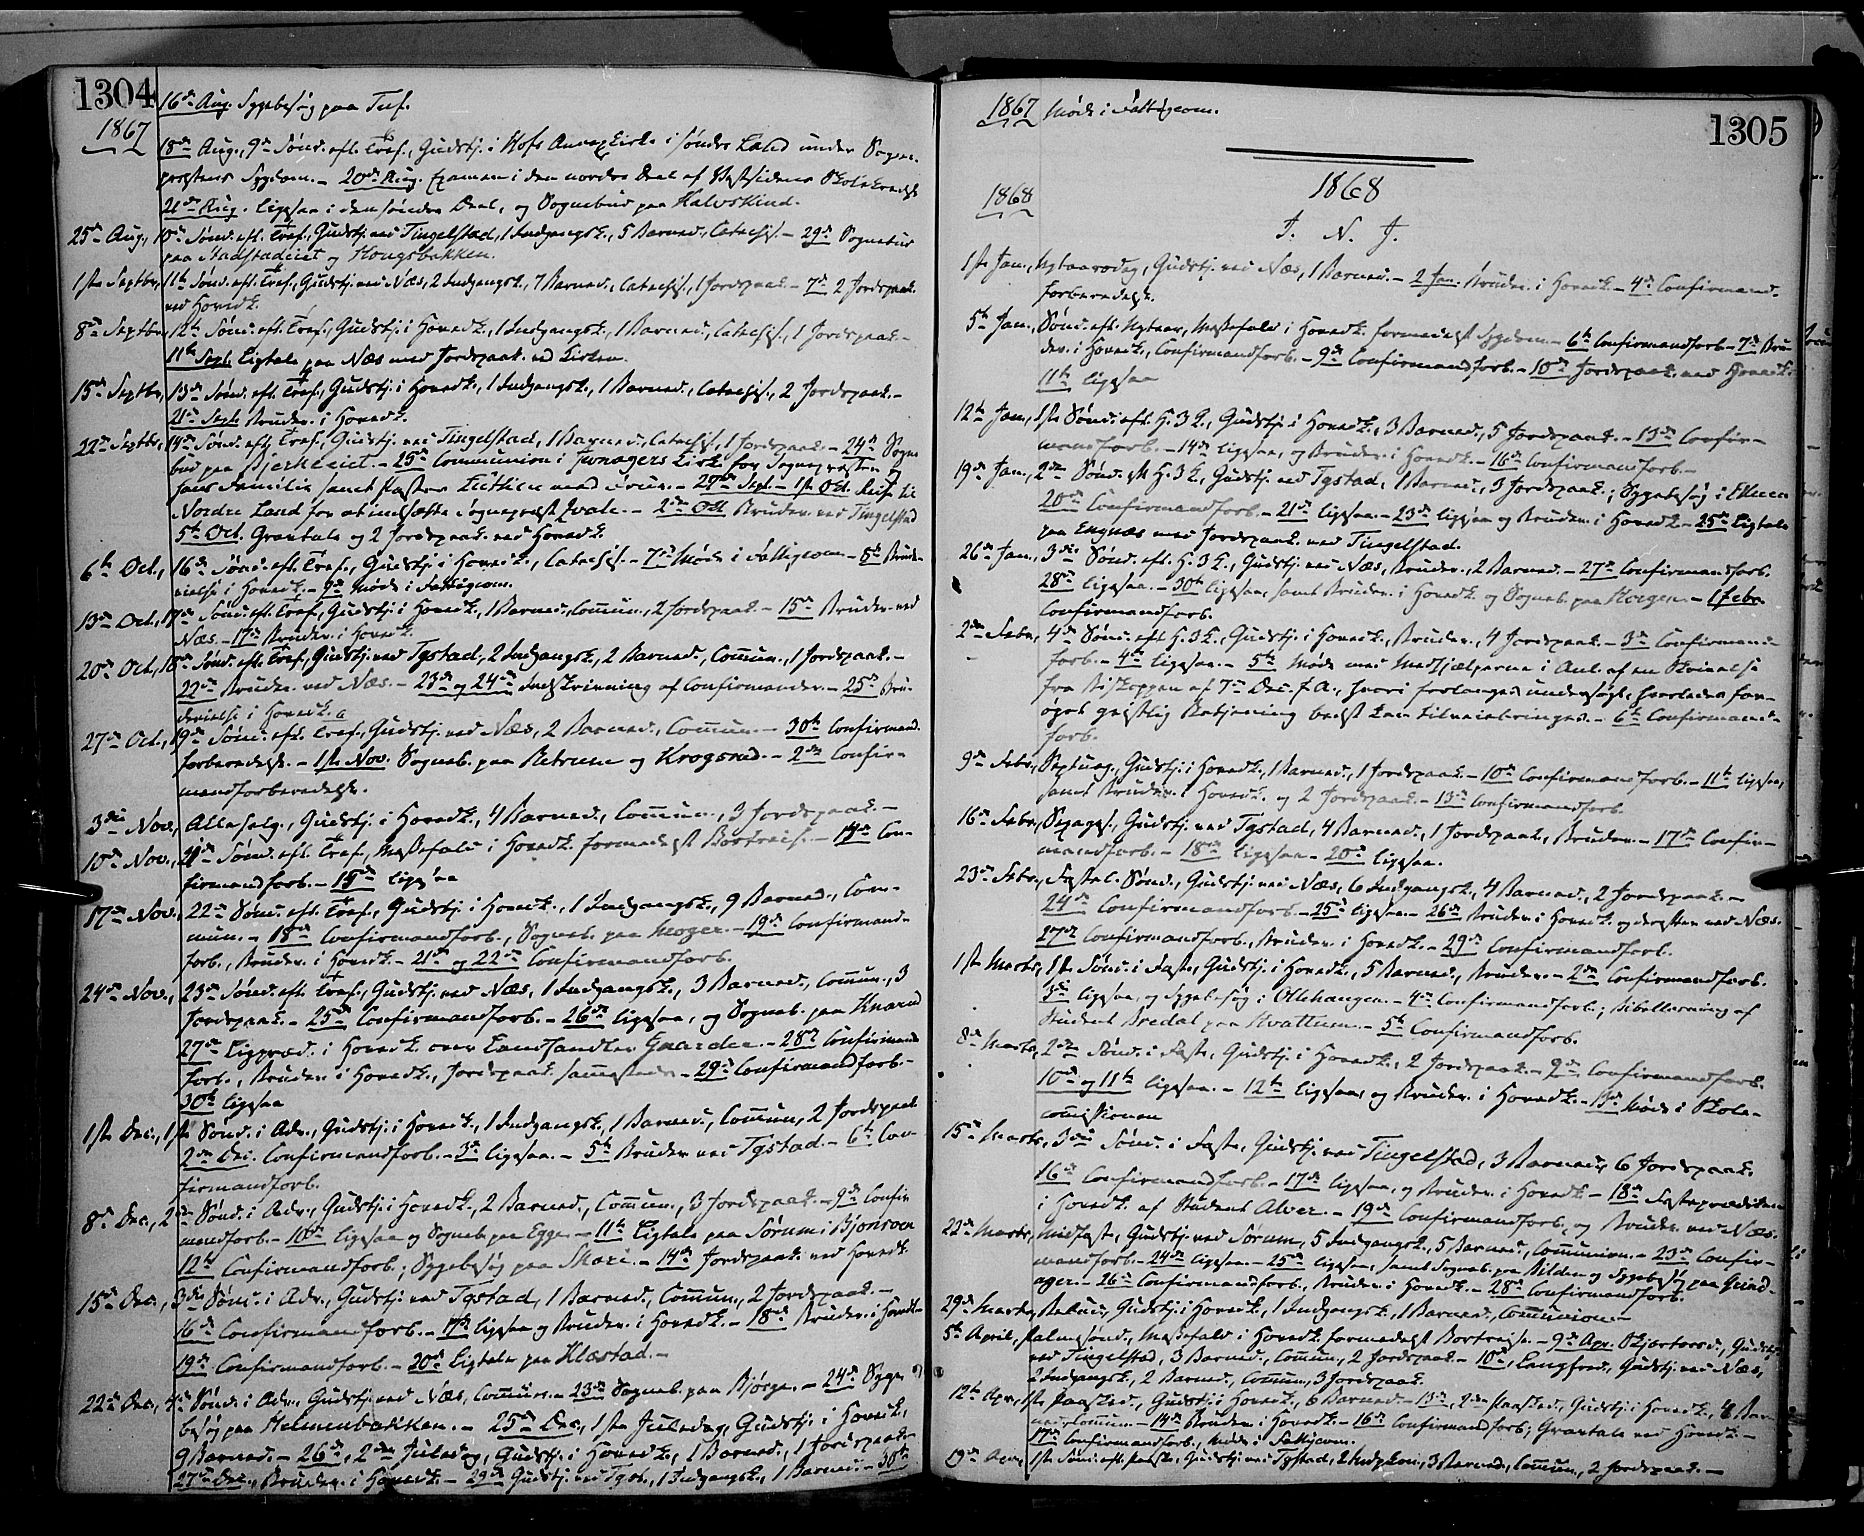 SAH, Gran prestekontor, Ministerialbok nr. 12, 1856-1874, s. 1304-1305